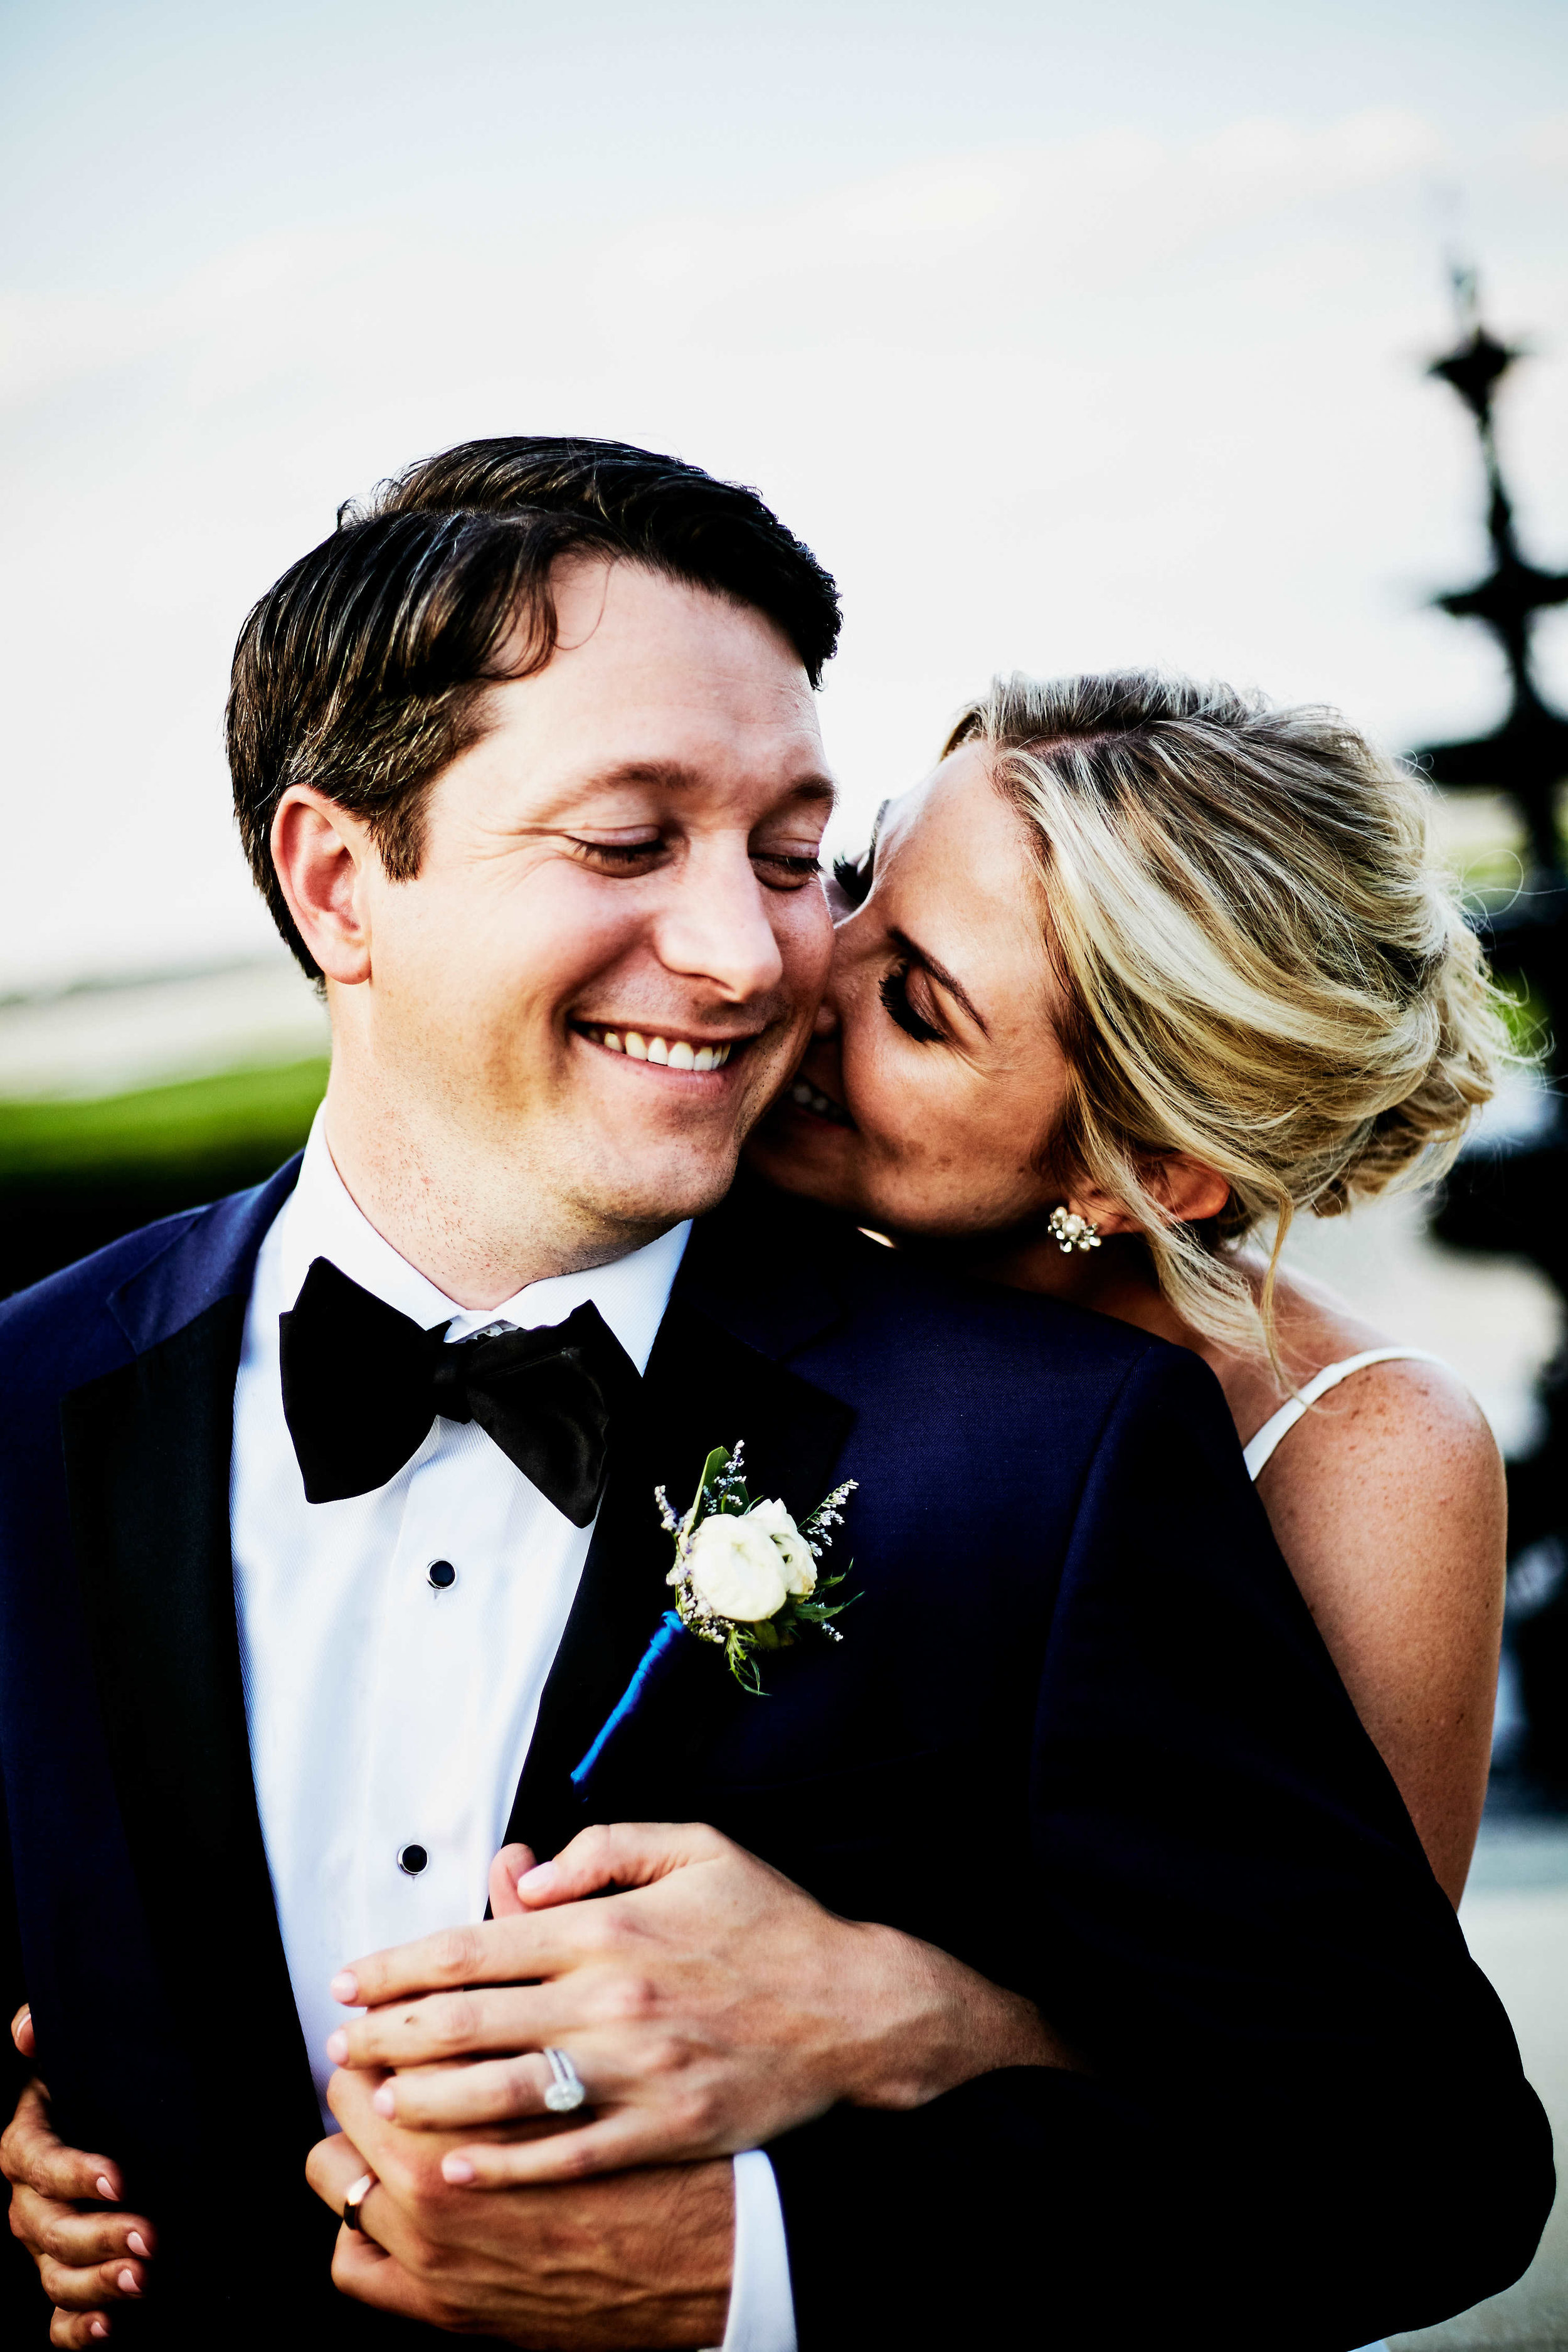 annie-and-greg-married-love-savannah-georgia-wedding-coordinator-belfair-plantation-wedding-southern-married-love.jpg